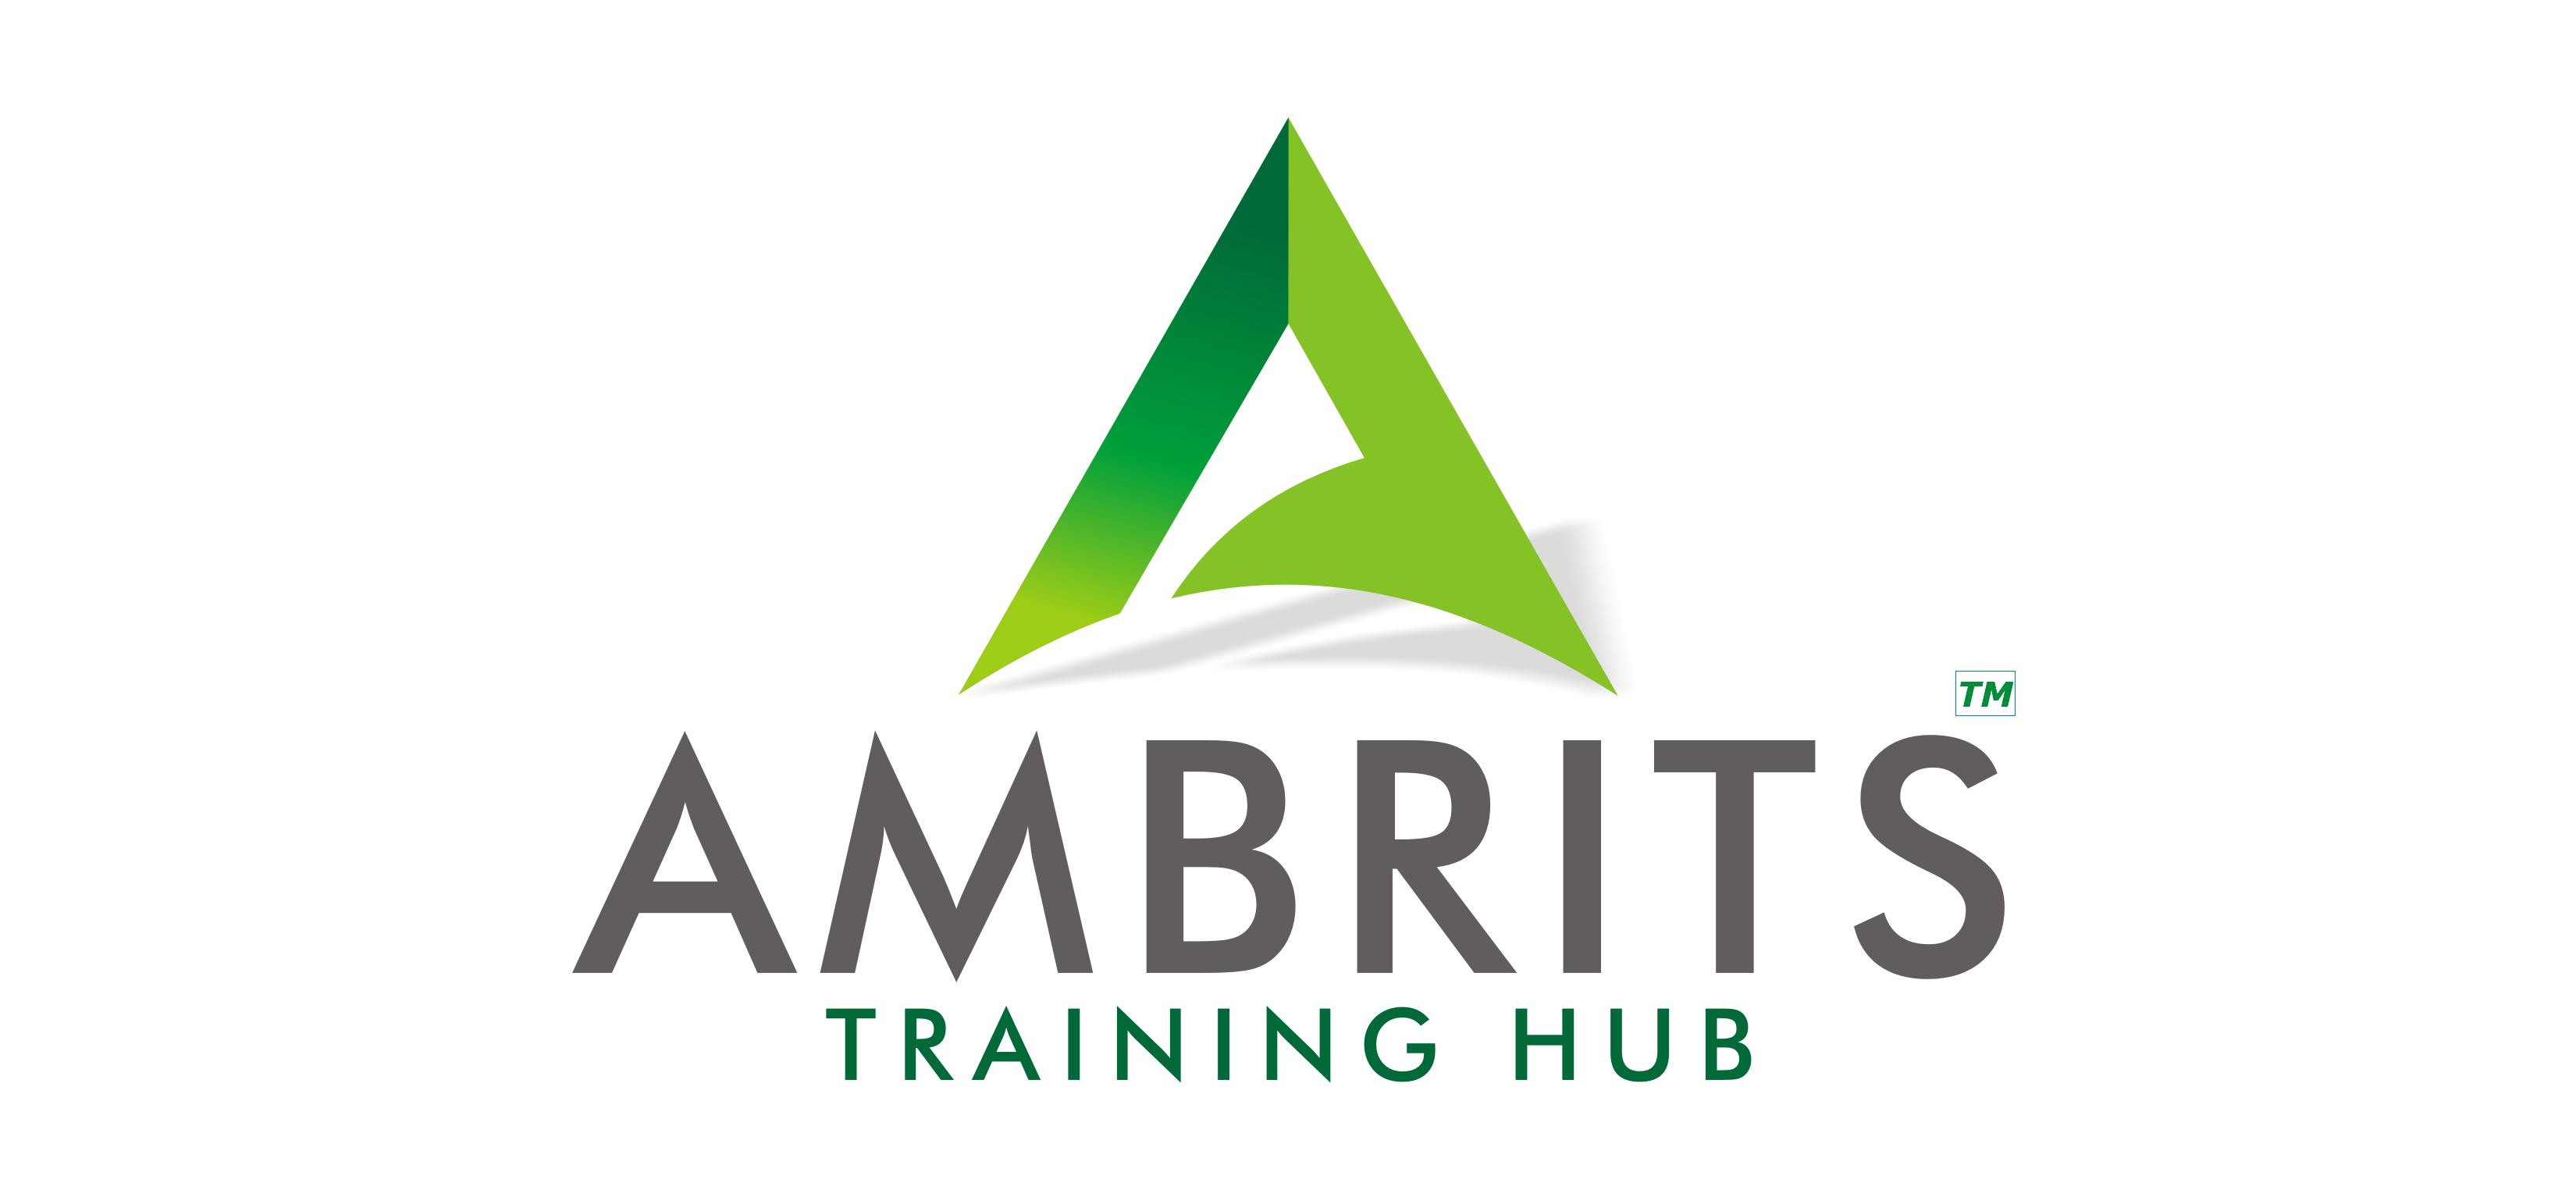 Ambrits Training Hub